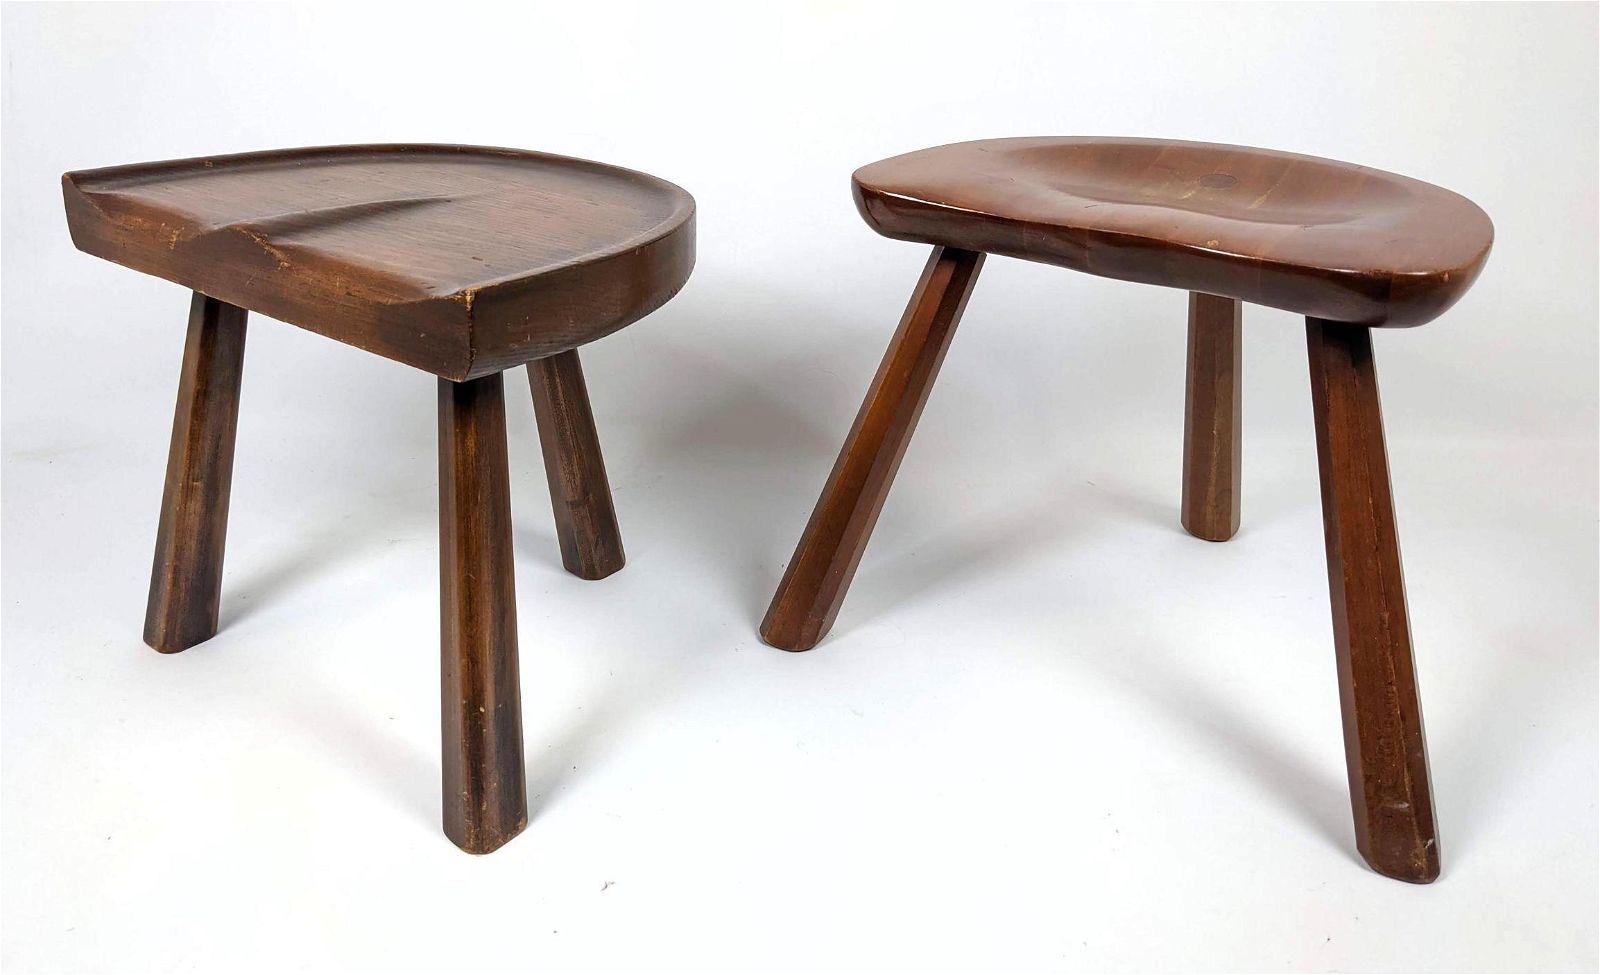 2 carved seat Three Leg Stools. 1 Pennsylvania House.